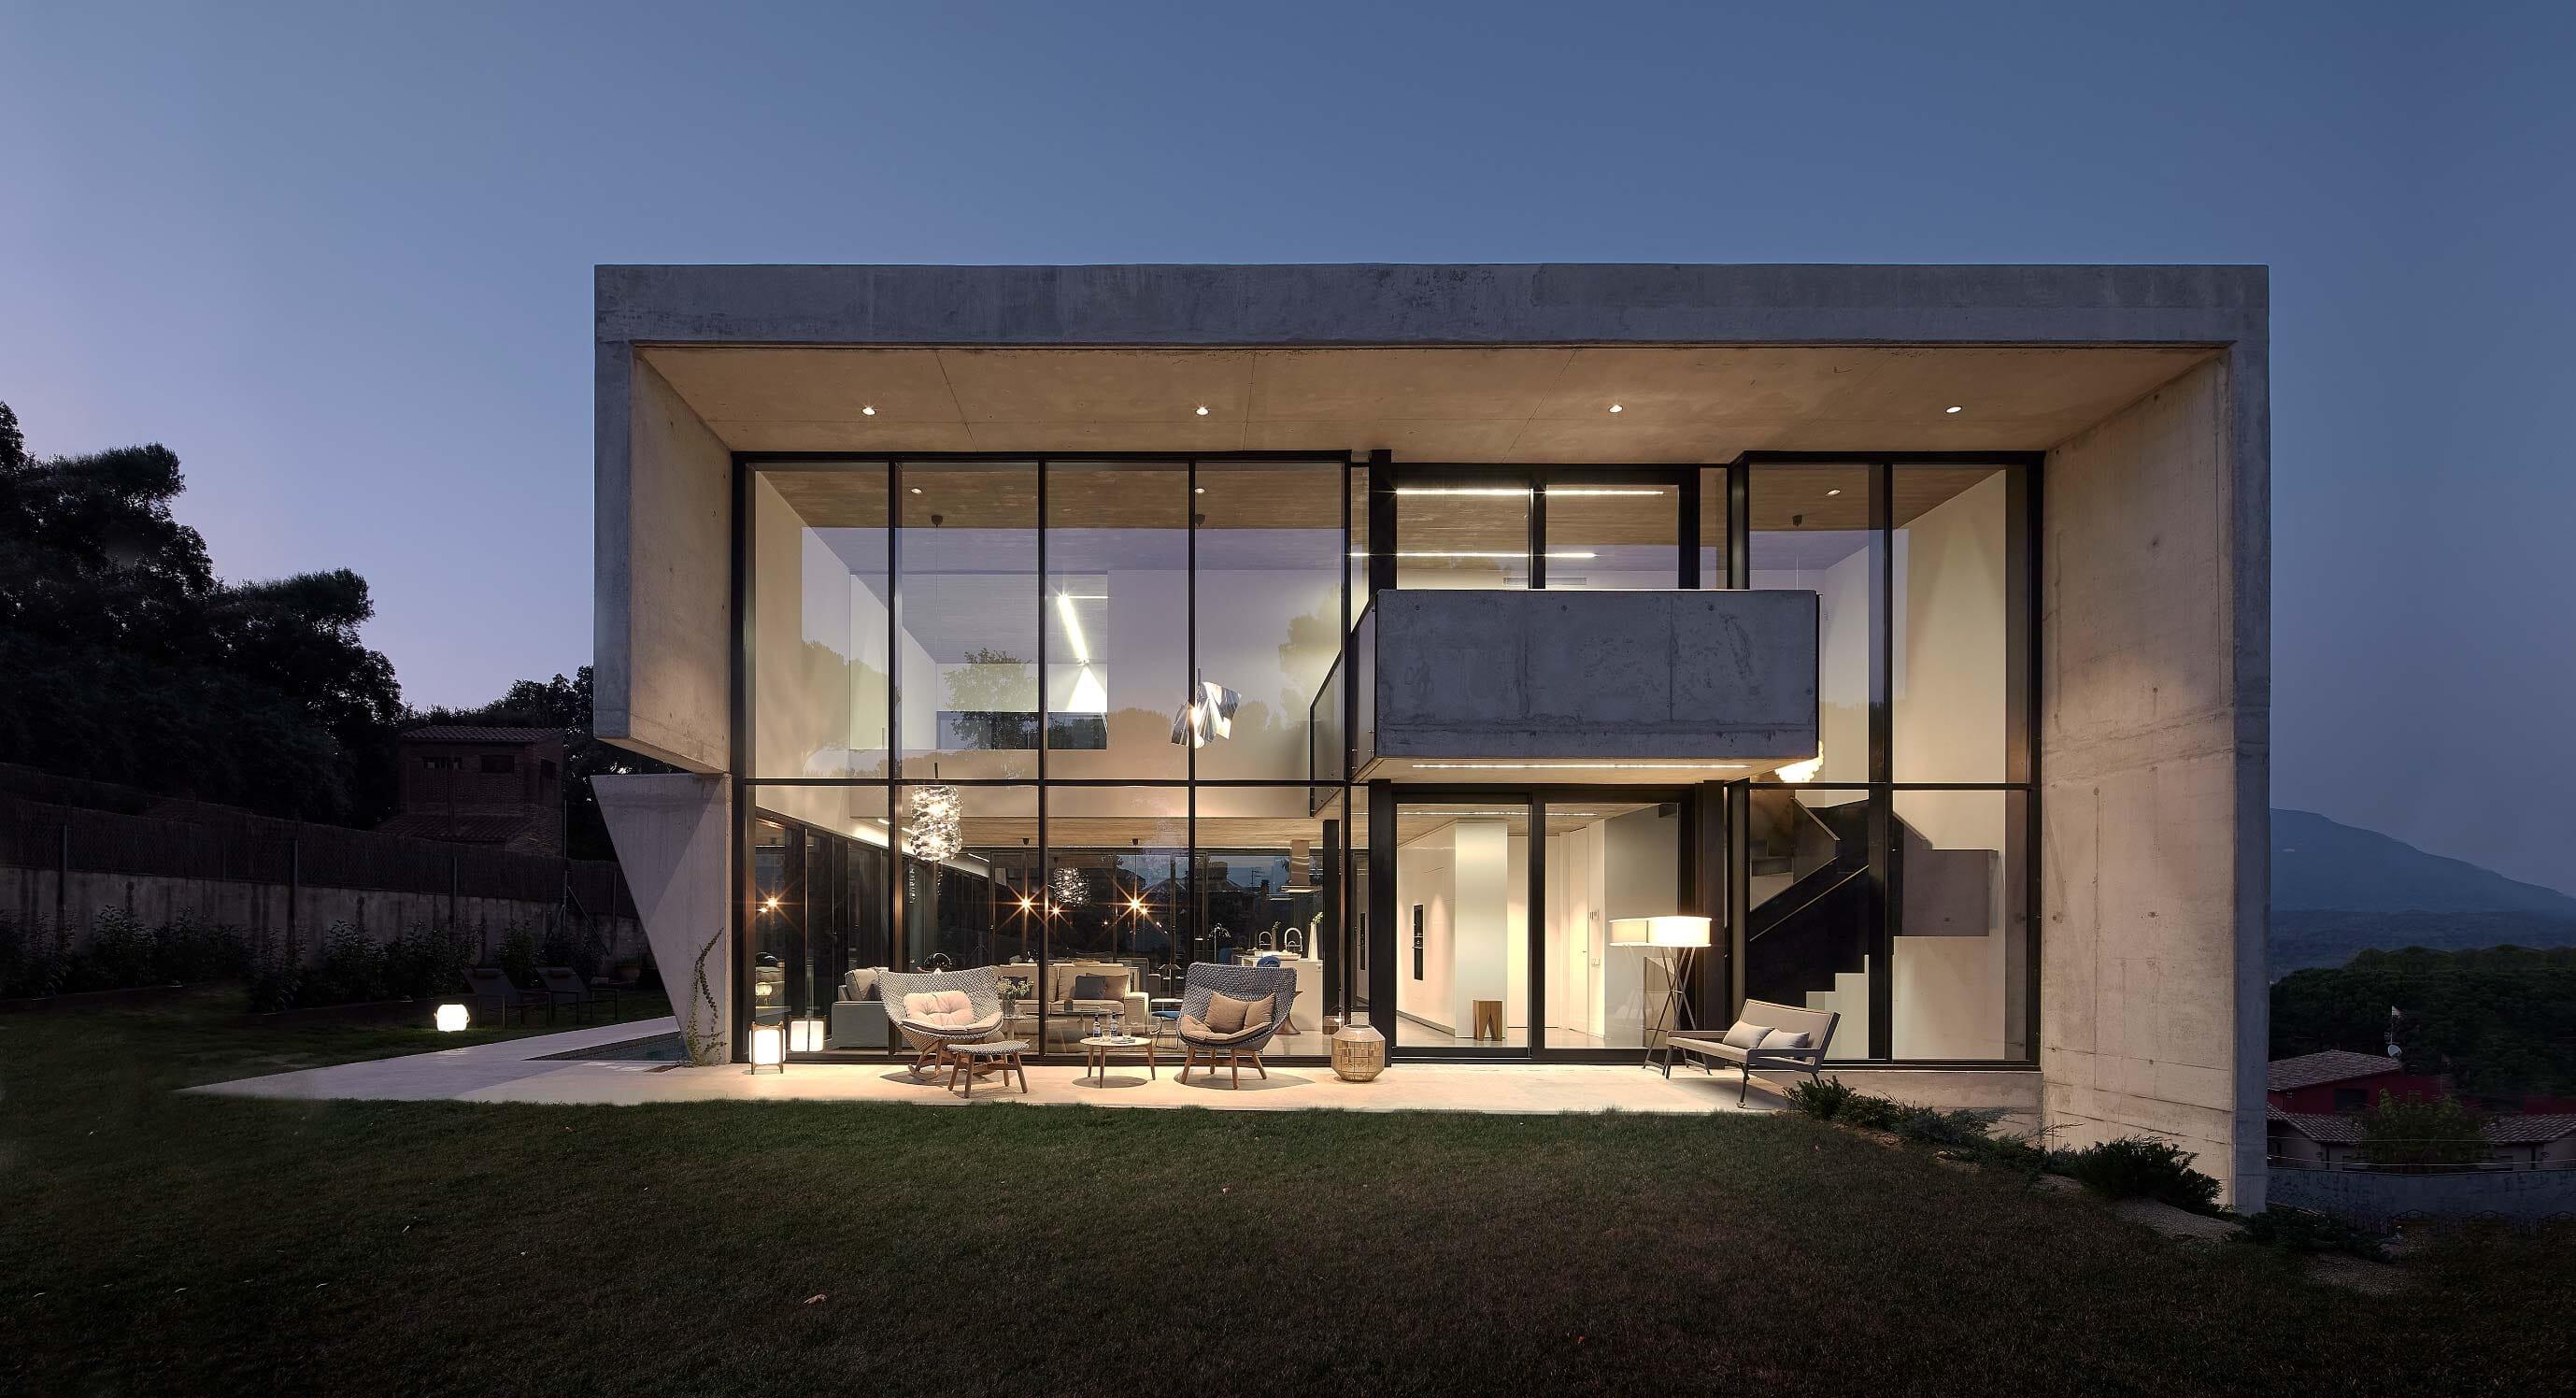 Bielmann House Shows The Future Of Eco-Friendly Living